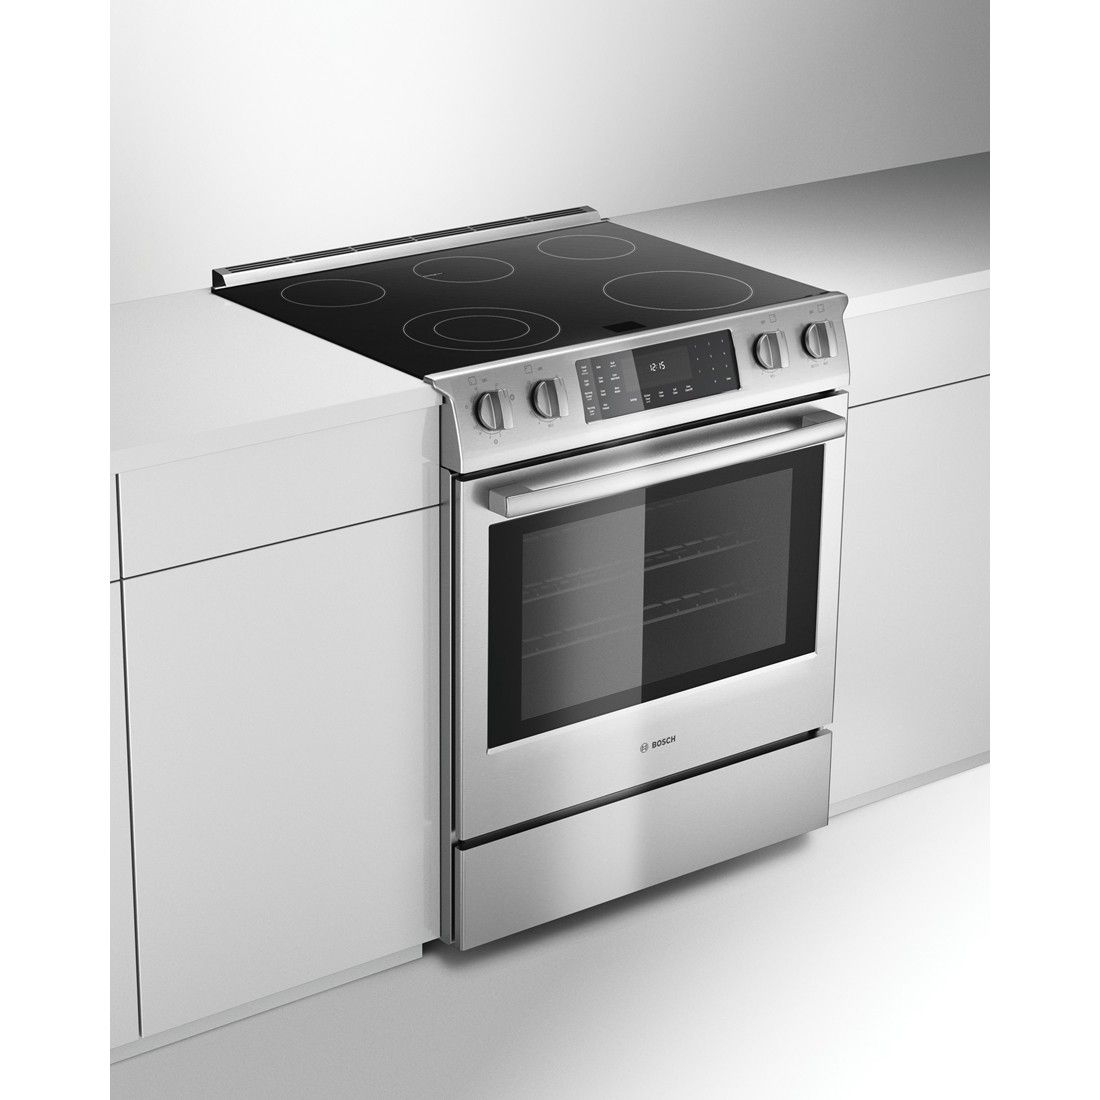 - Products - Cooking & Baking - Ranges - HEI8054U Slide In Range